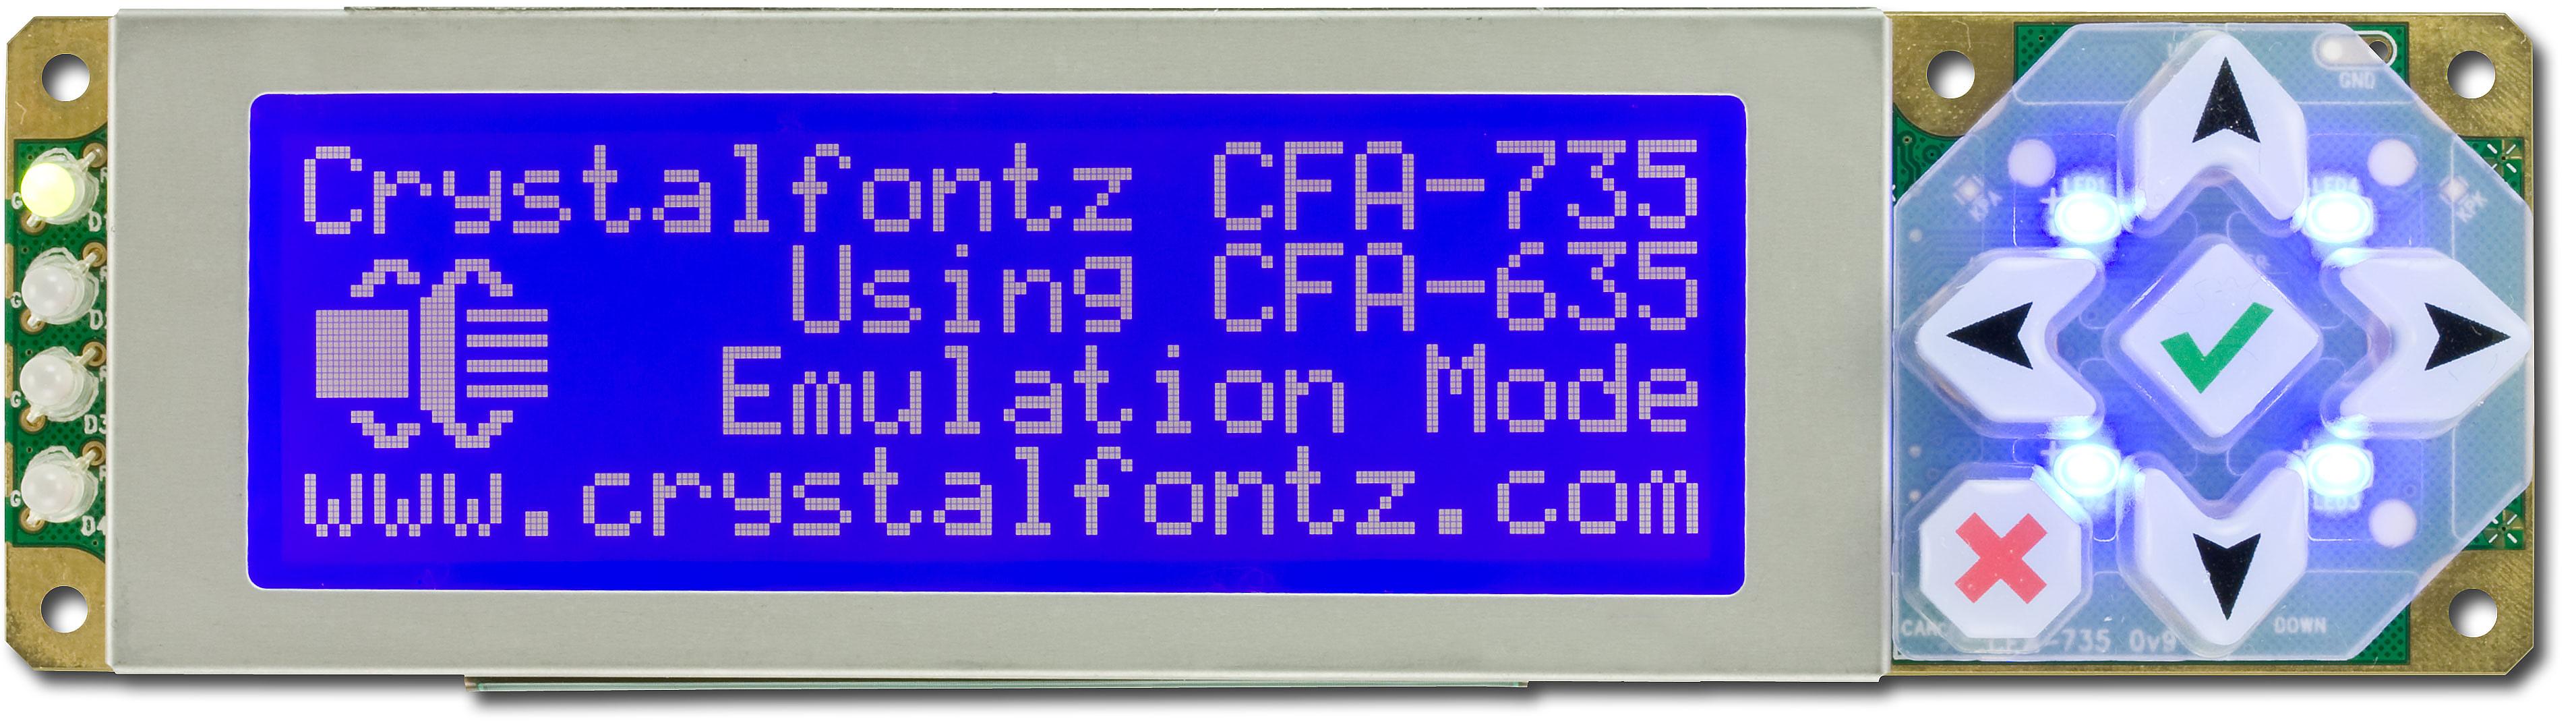 Crystalfontz LCD Module USB Drivers Download (2019)